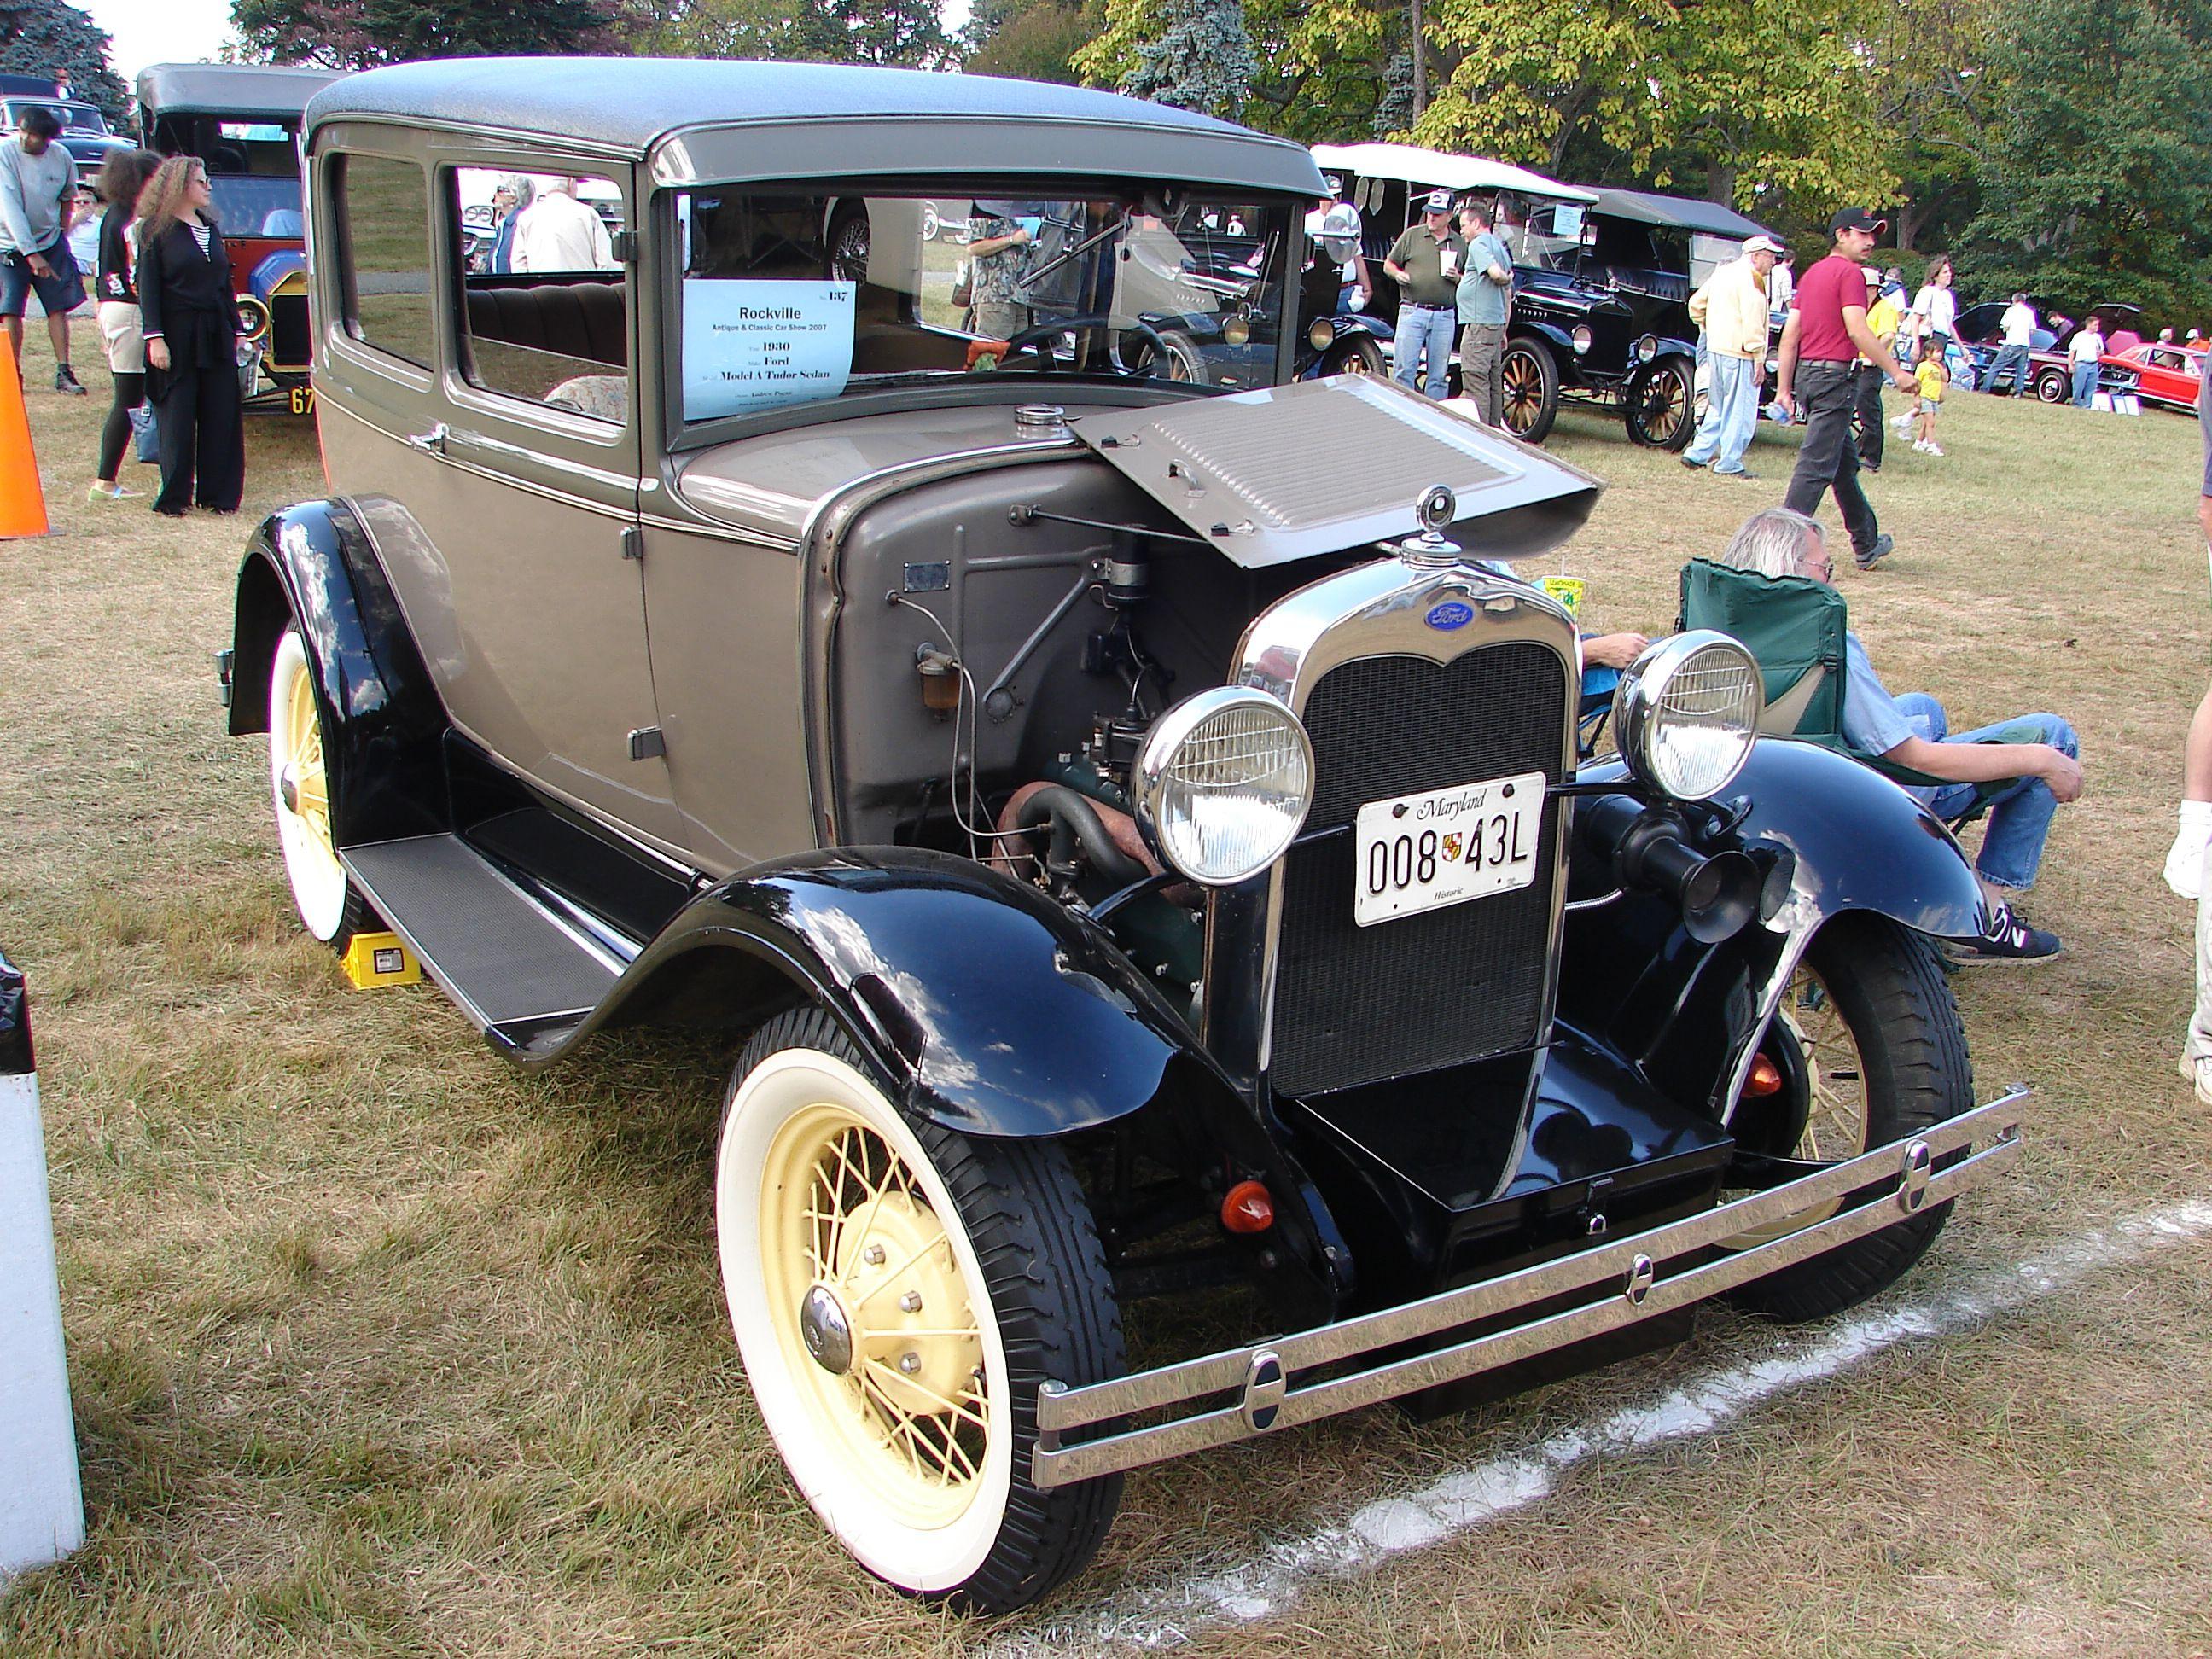 Rockville Antique Car Show 2017 - Rockville, Maryland